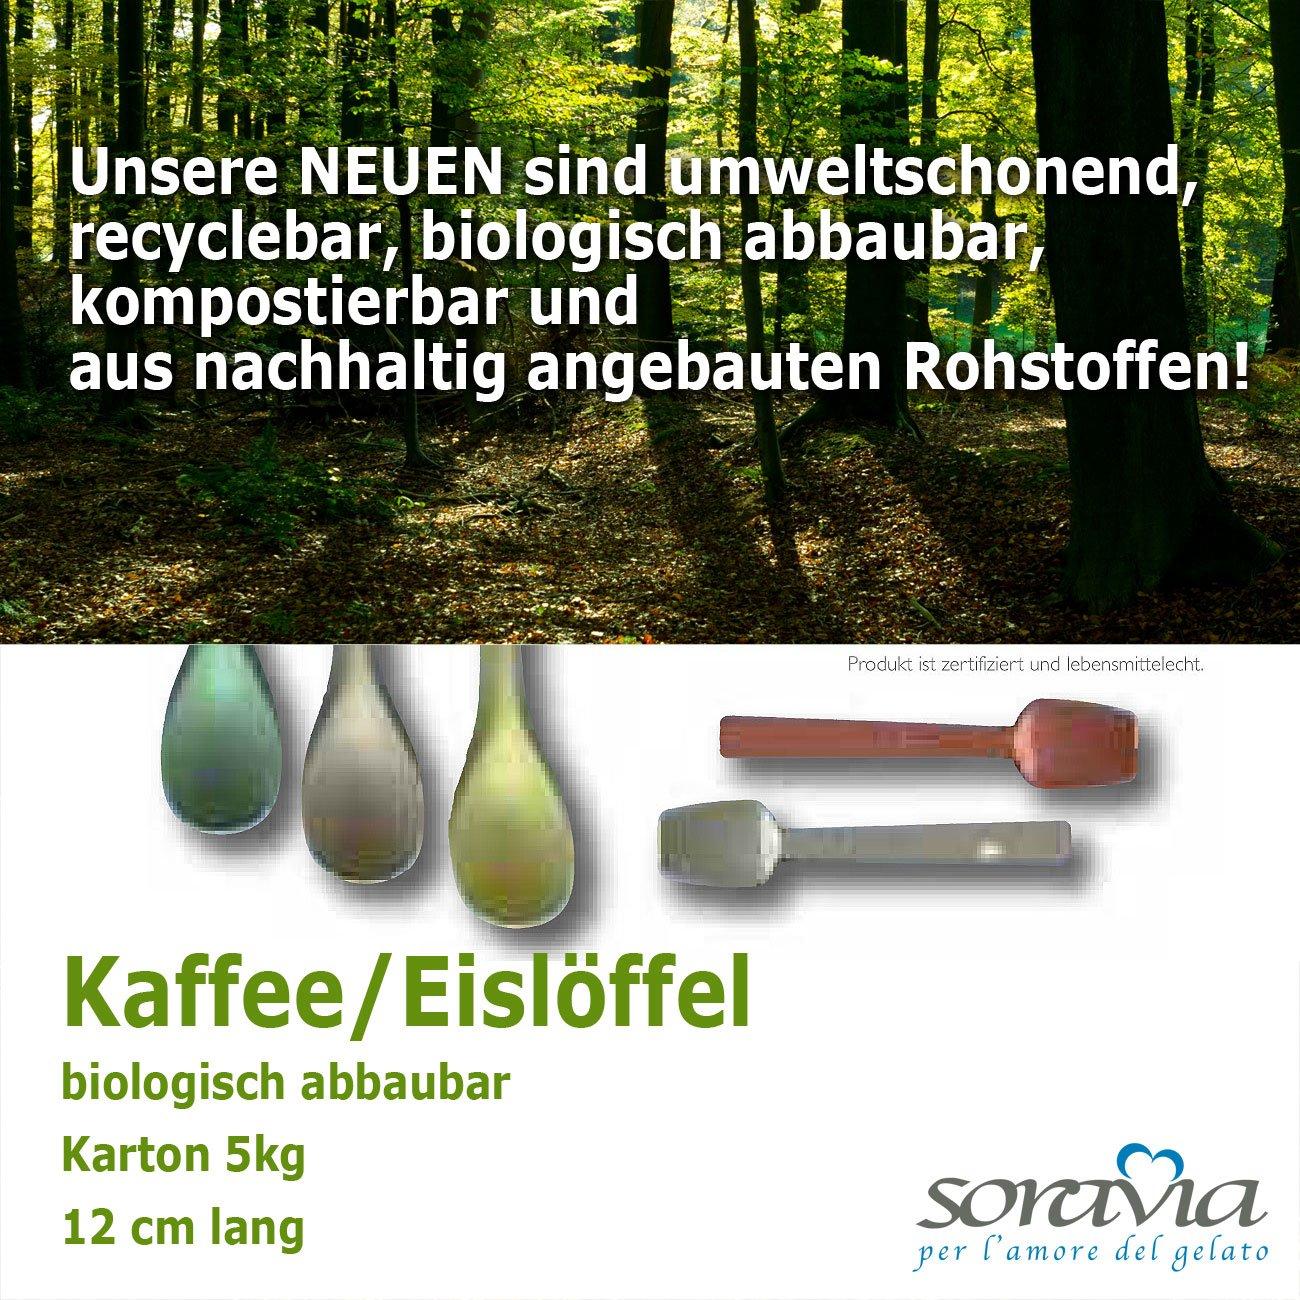 Bio Kaffeelöffel Eislöffel - 12,00 cm - Karton 5,00 kg